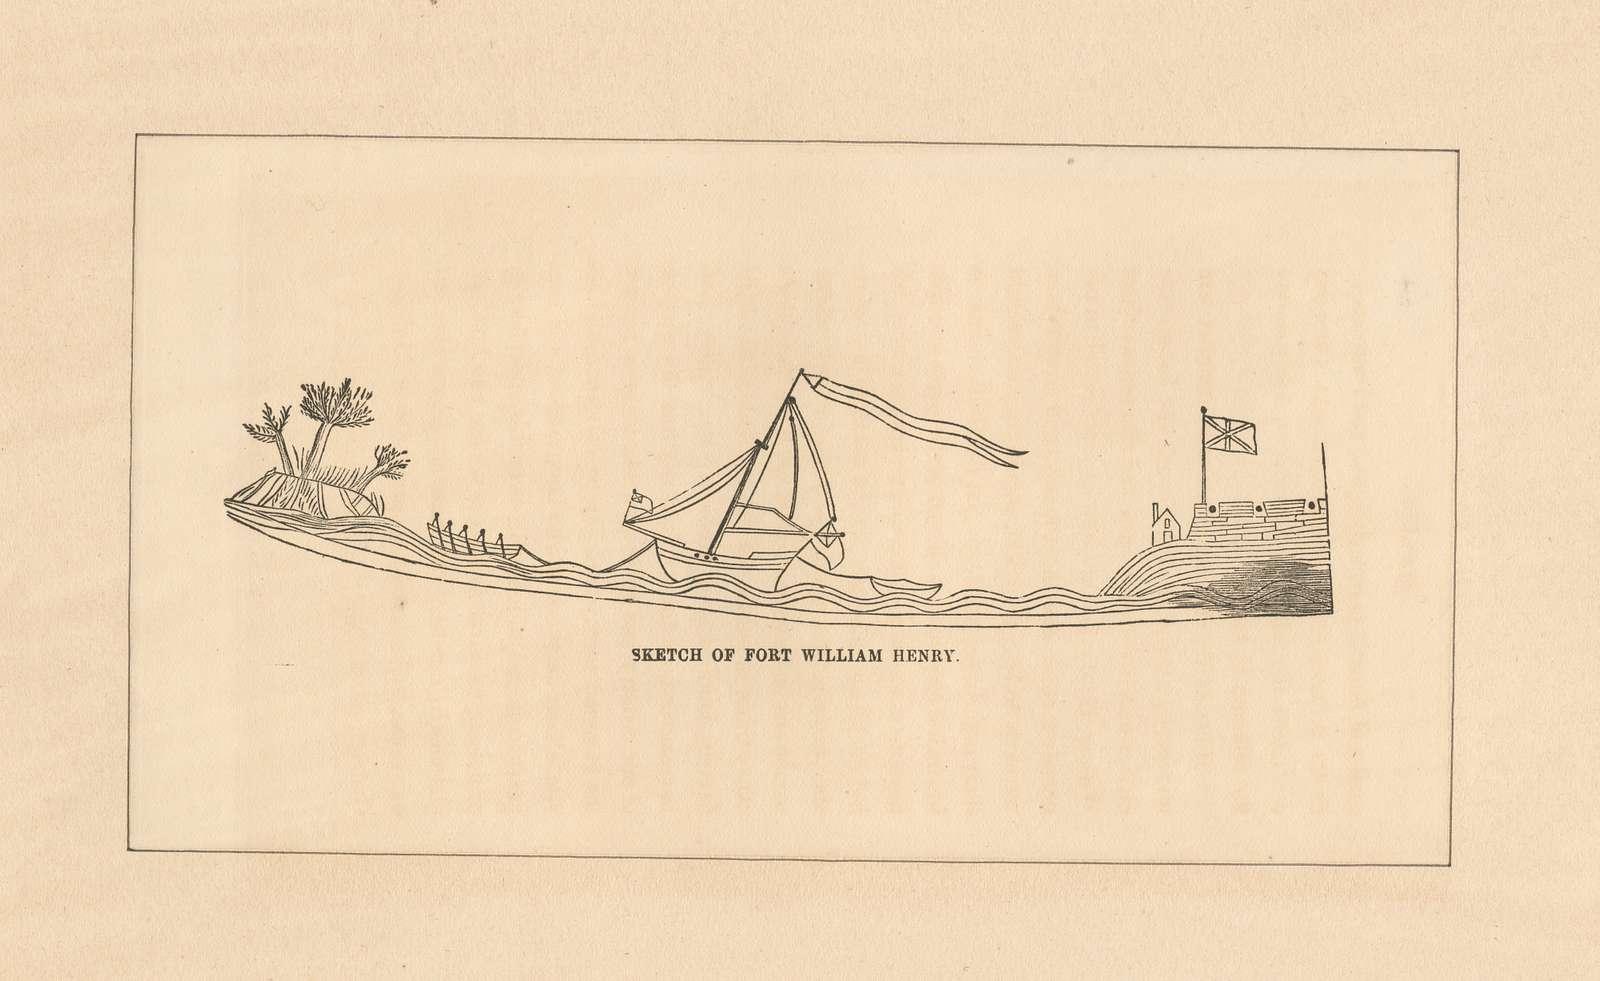 Sketch of Fort William Henry.